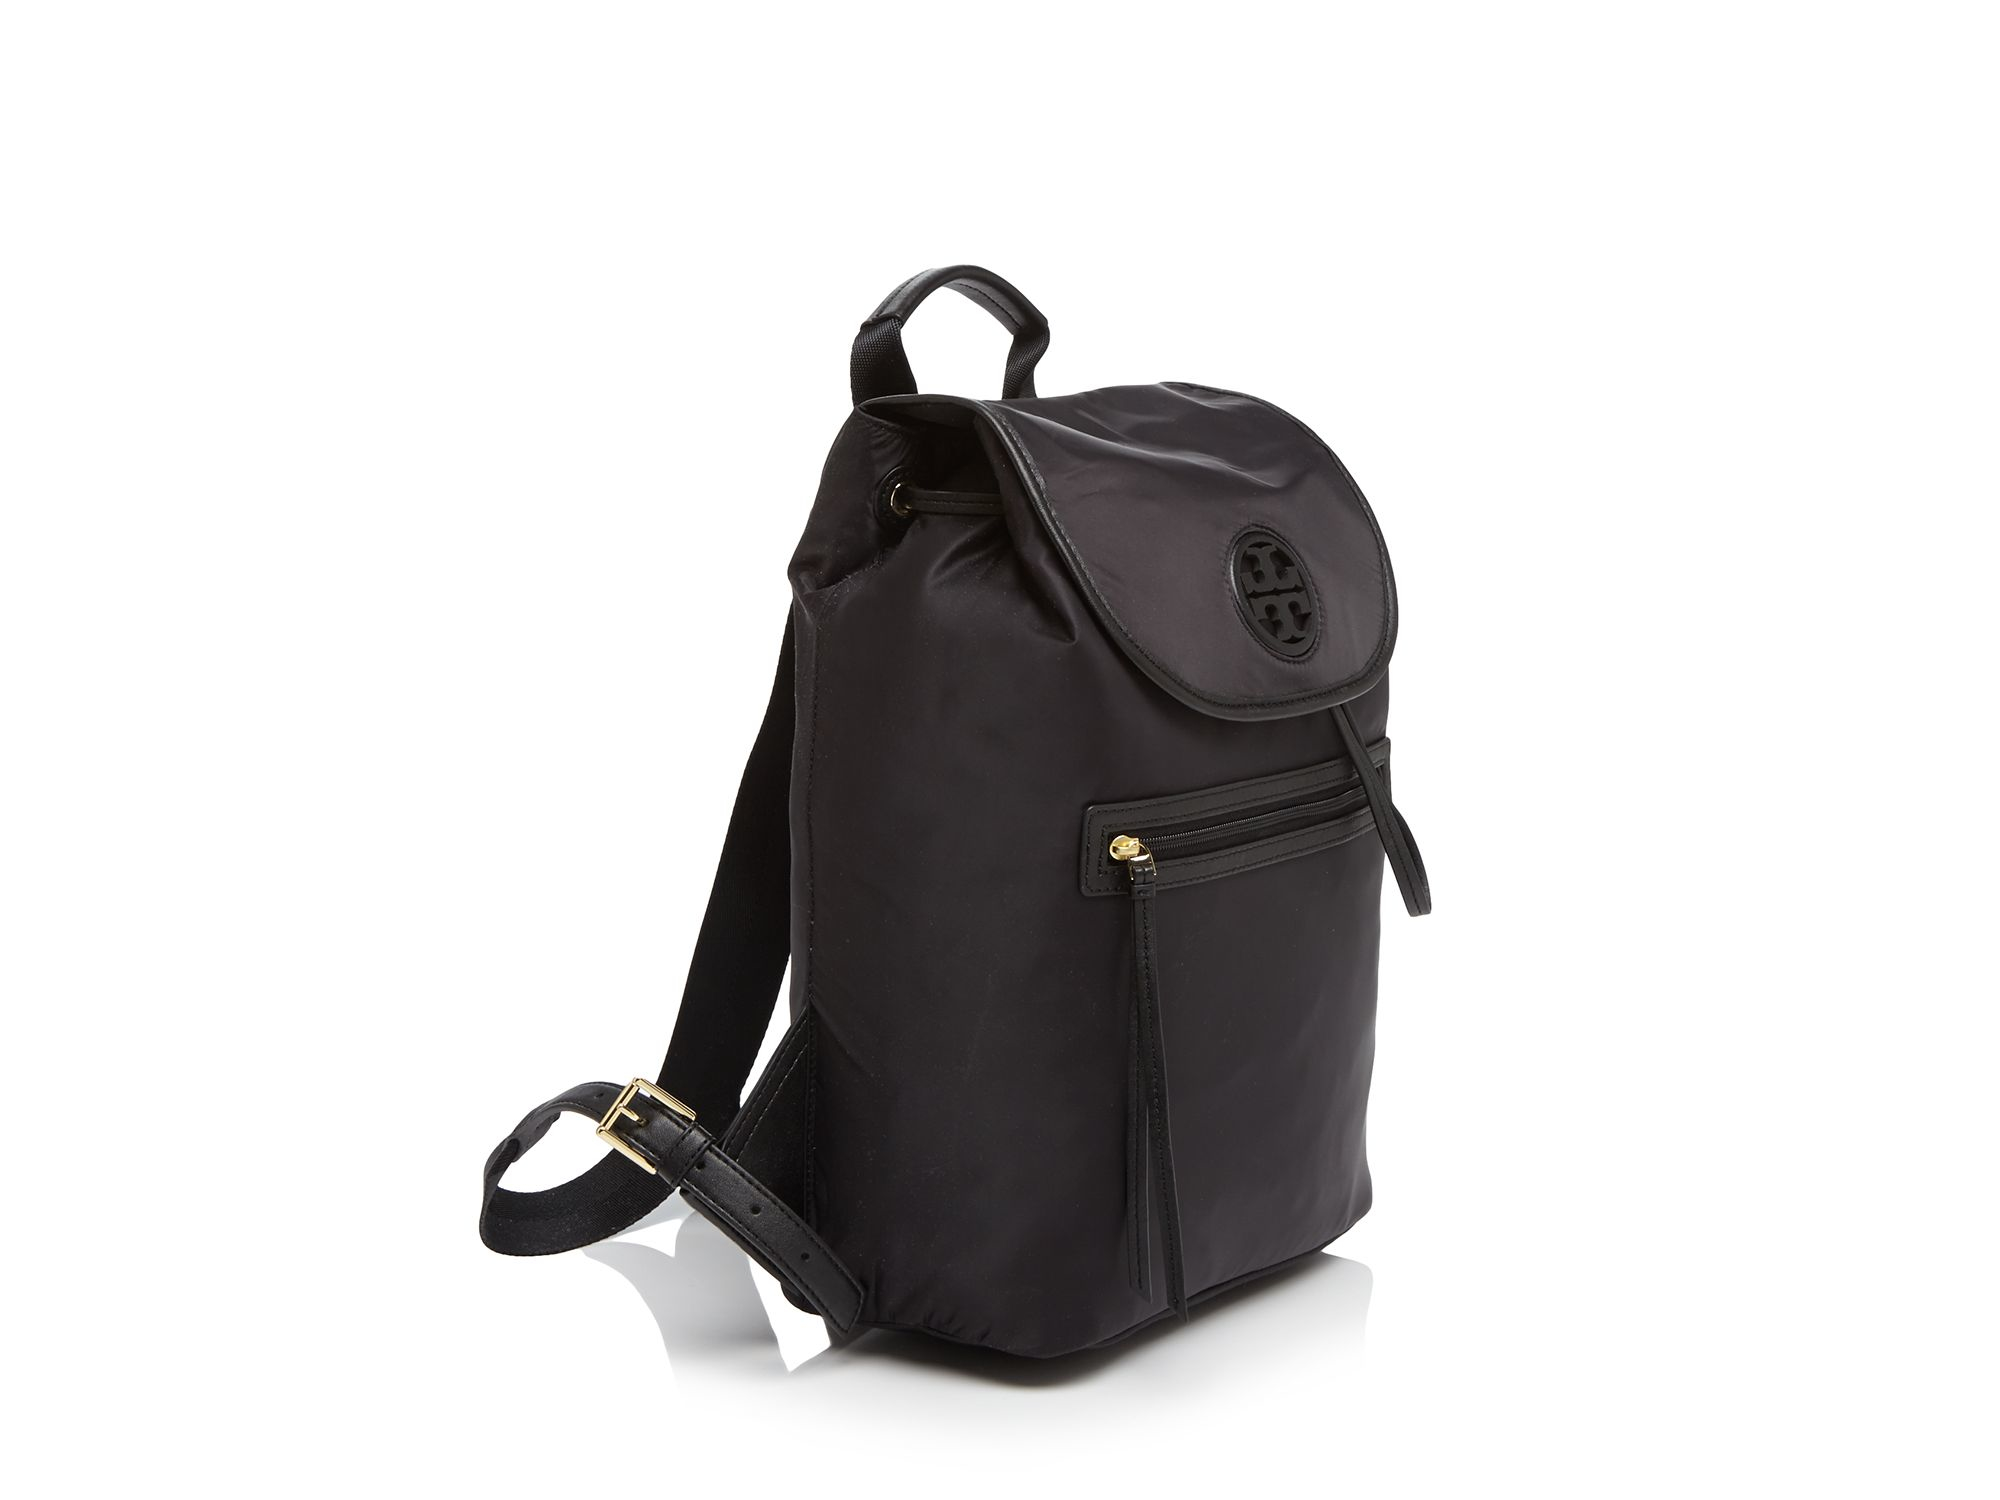 5b825589c04f Tory Burch Travel Nylon Flap Backpack- Fenix Toulouse Handball